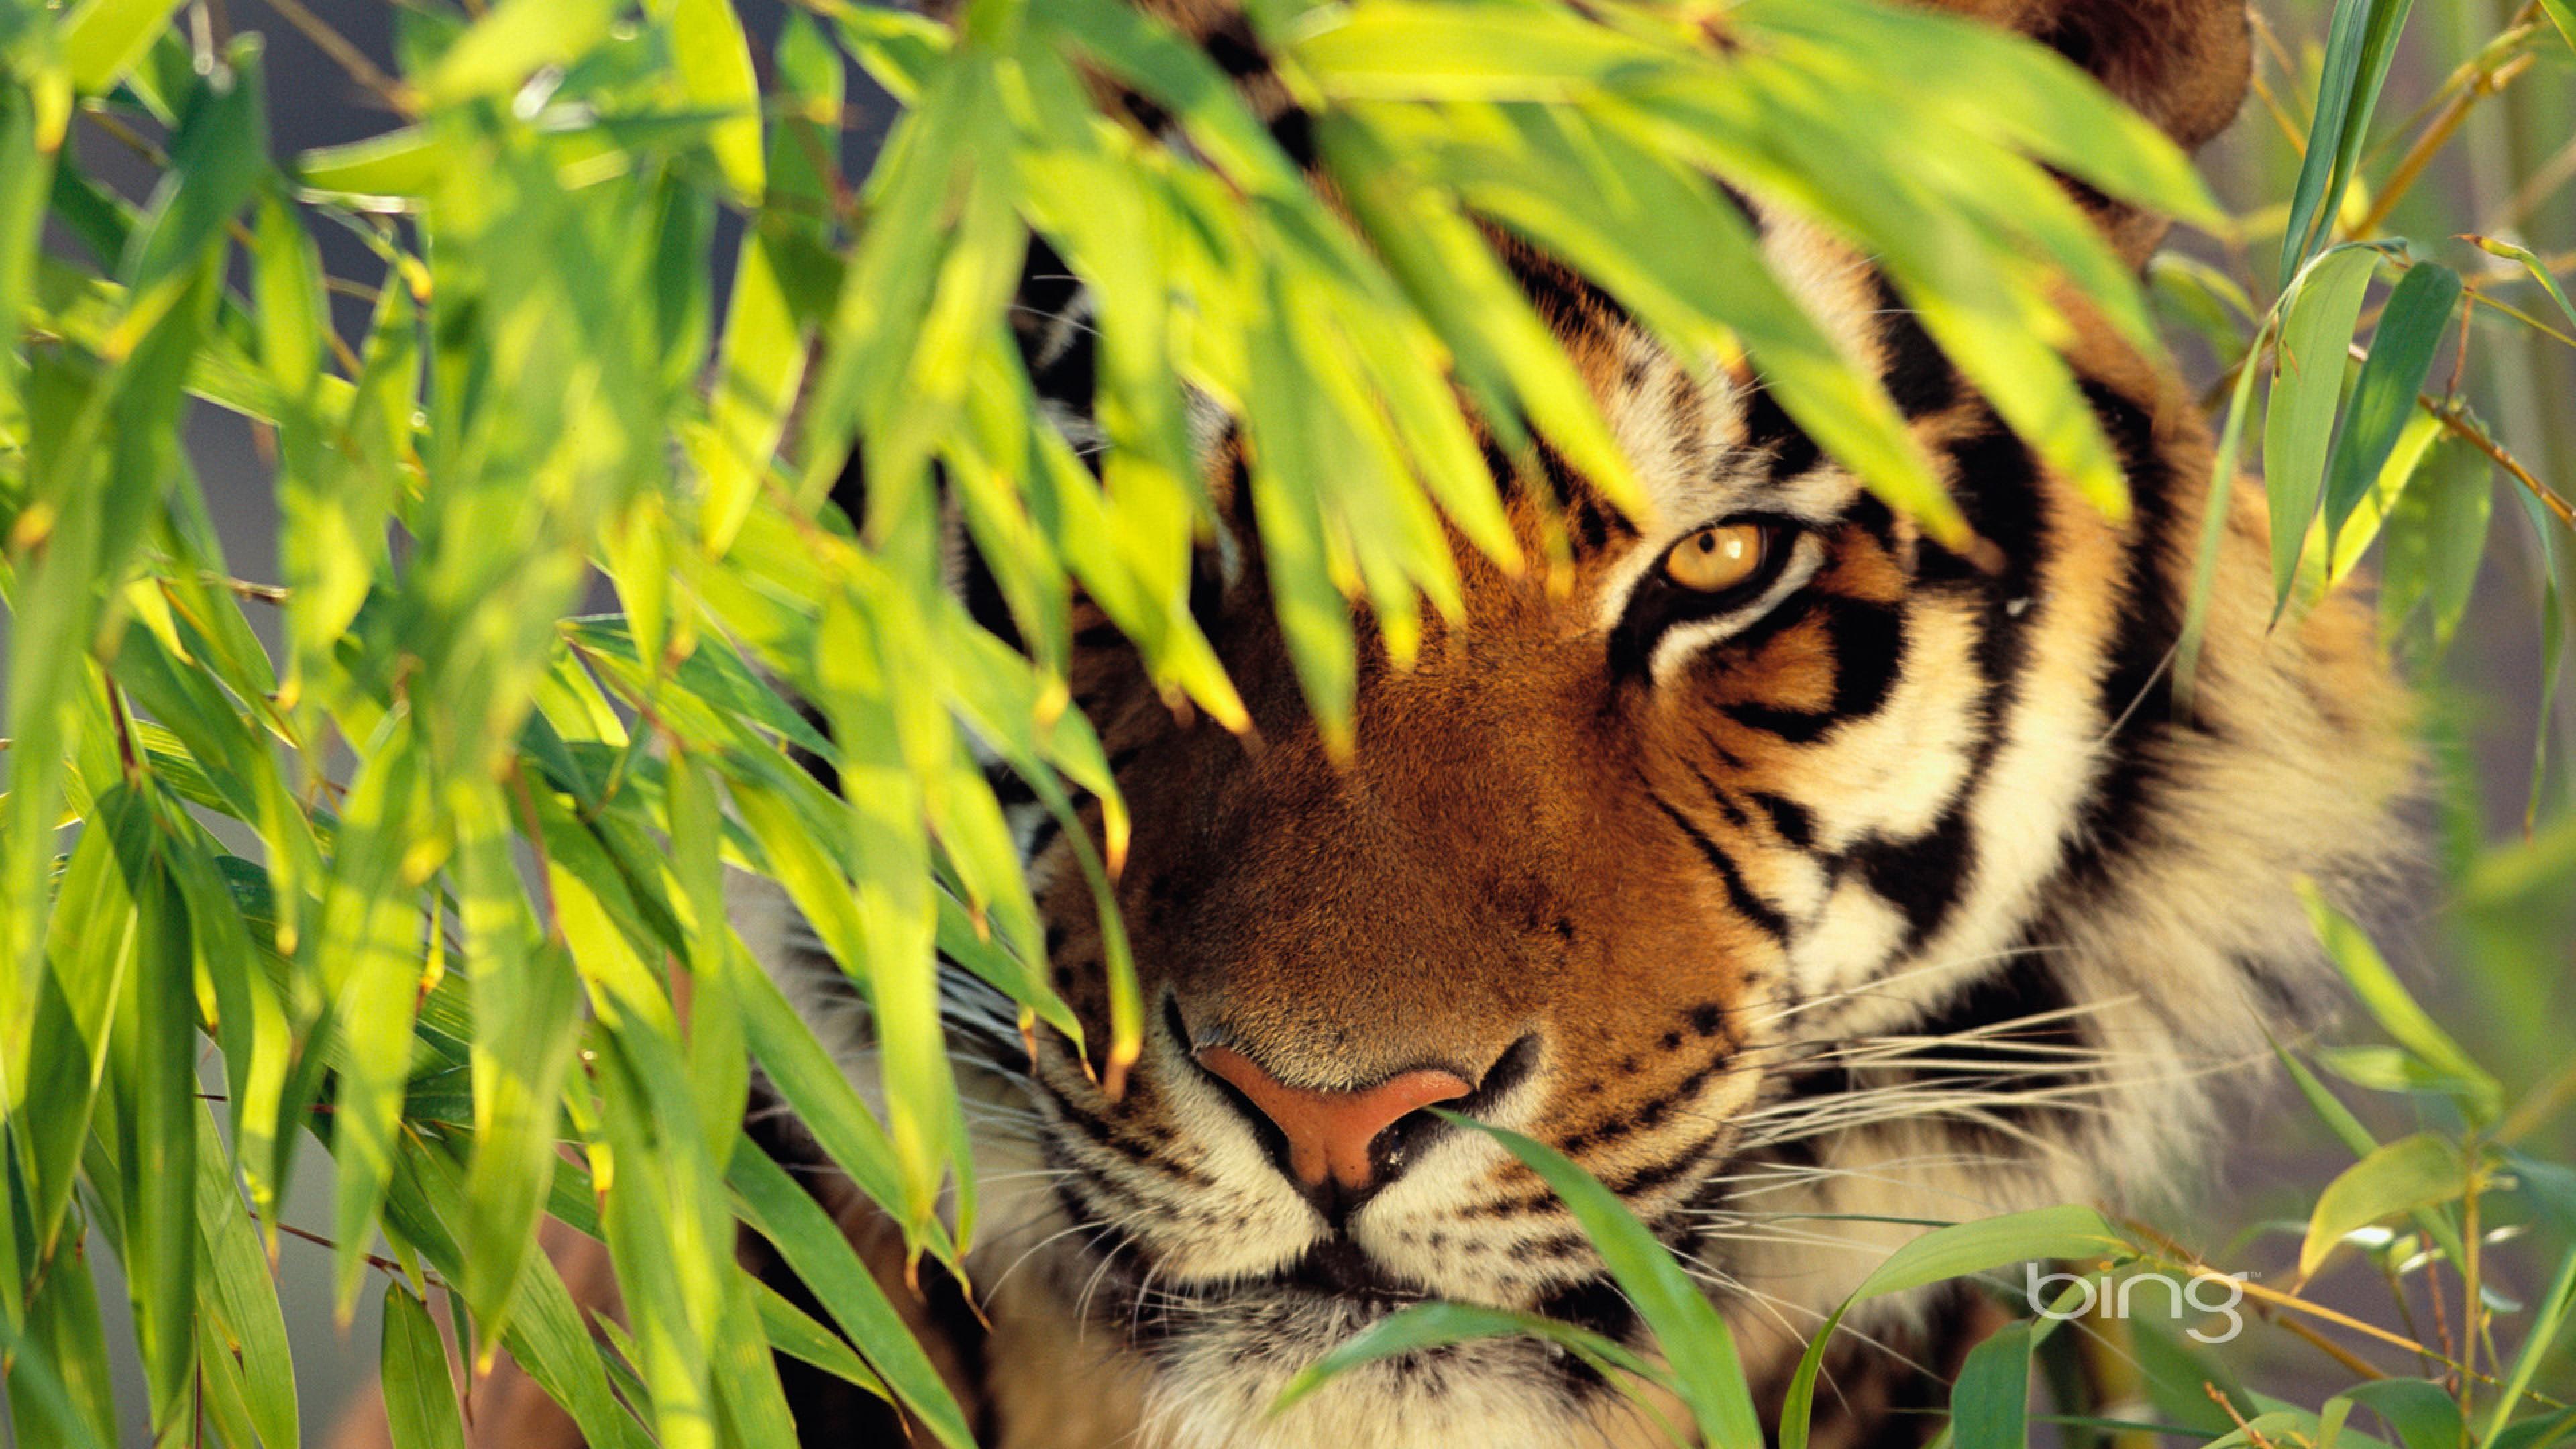 wallpaperswidecom animals hd desktop wallpapers for 4k - HD